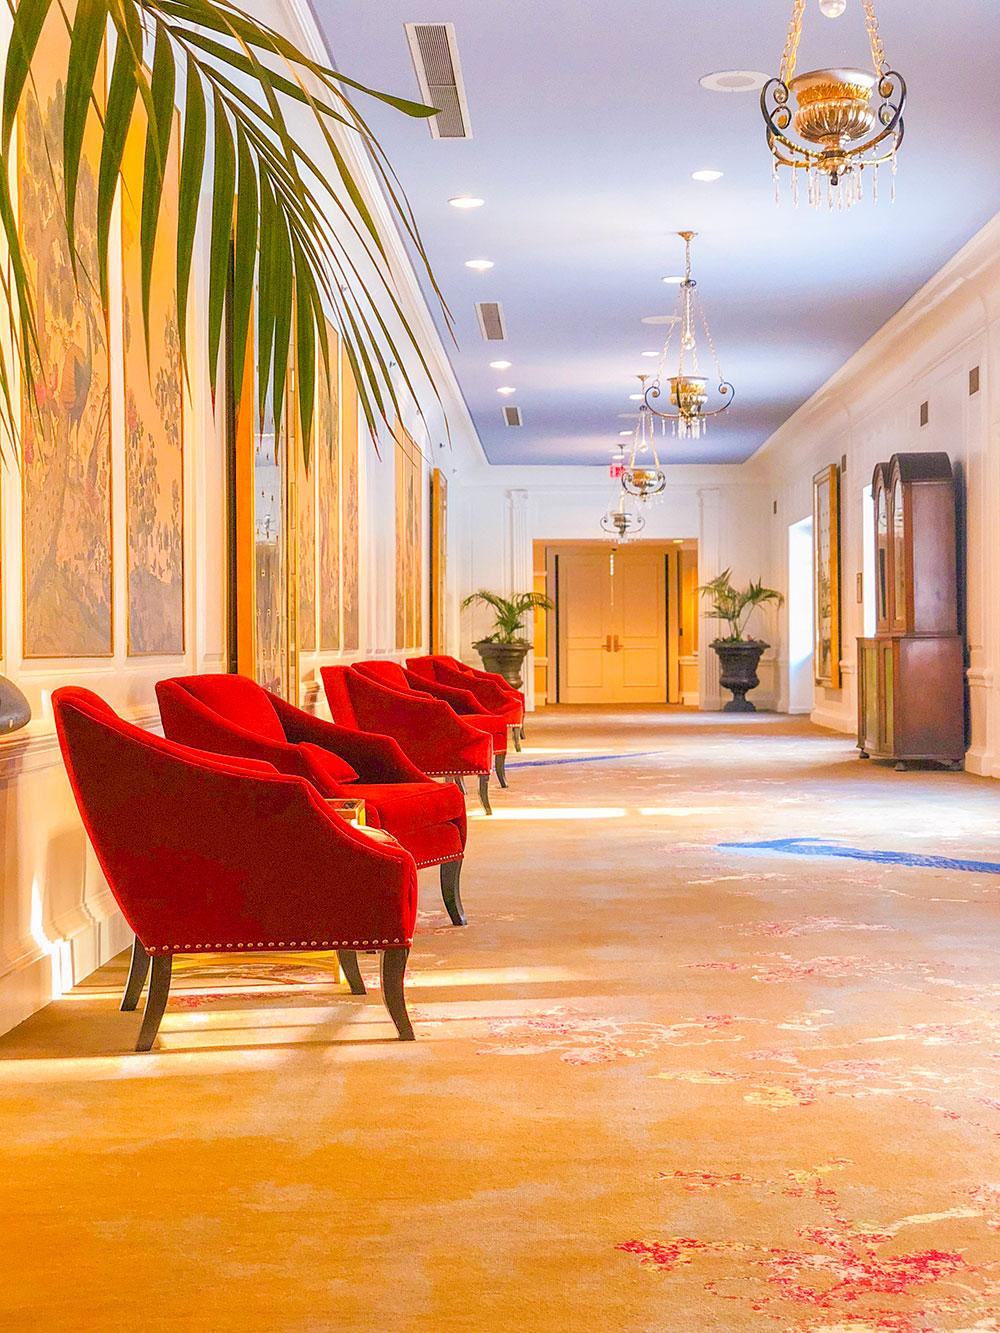 shaunda necole in hotel roanoke beautiful halls